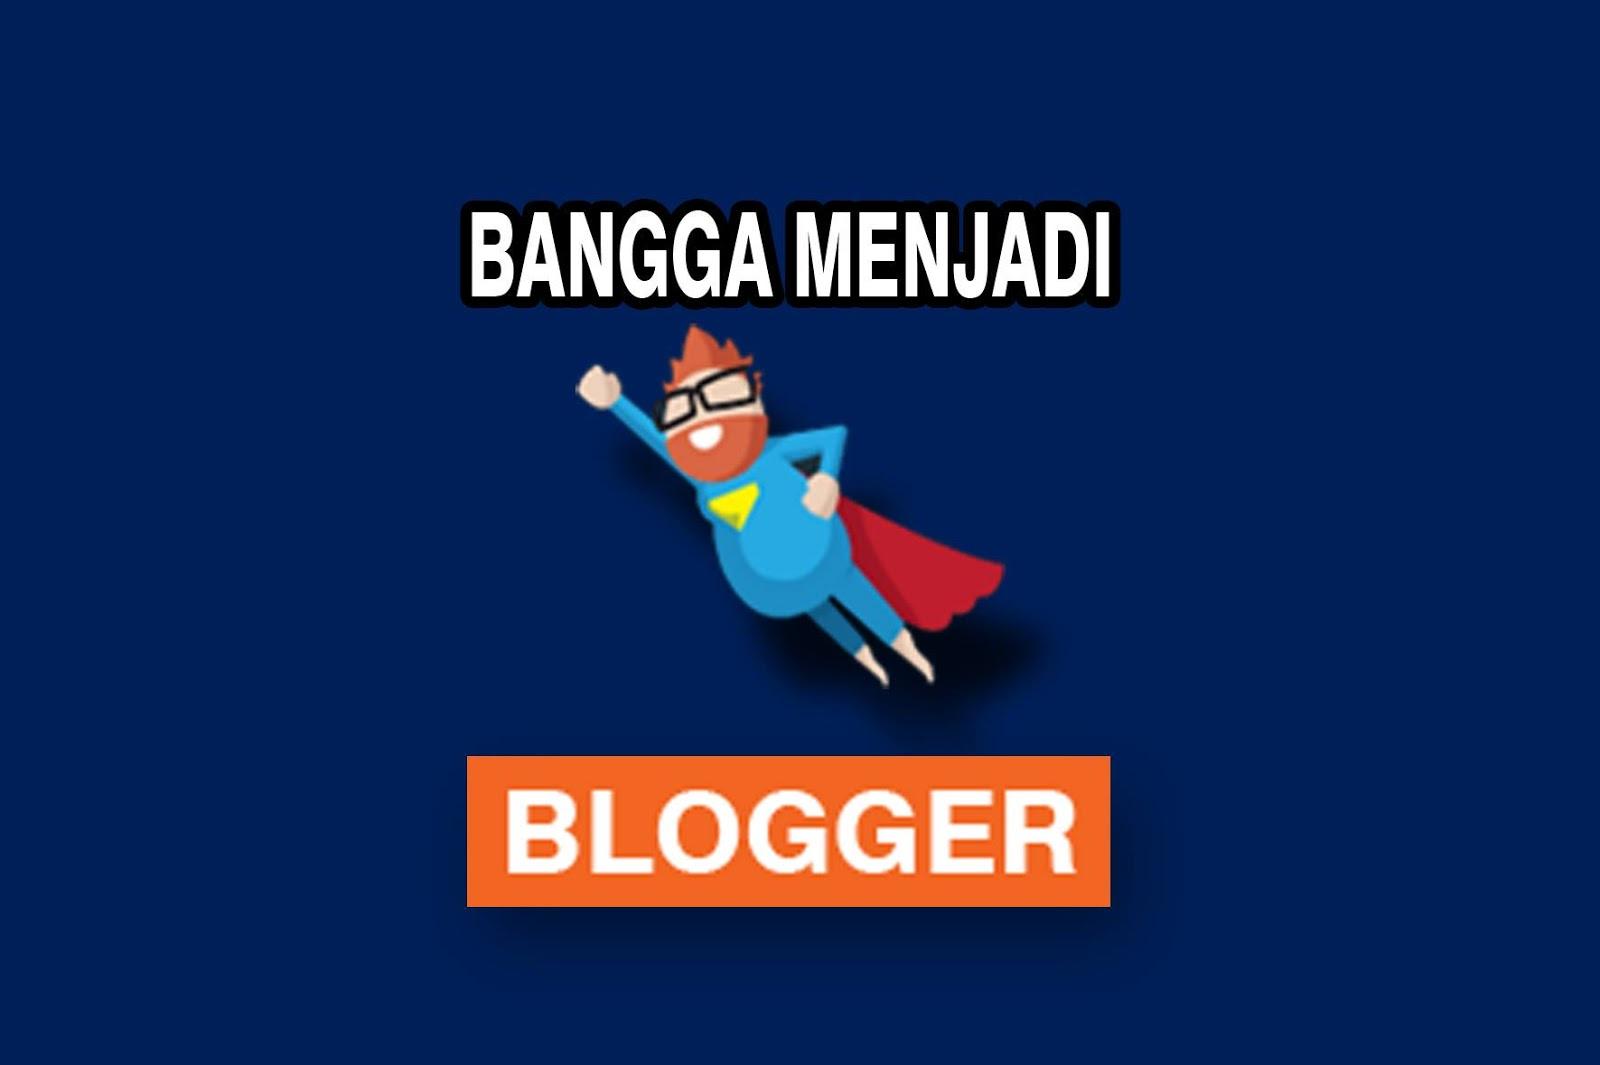 Bangga menjadi blogger